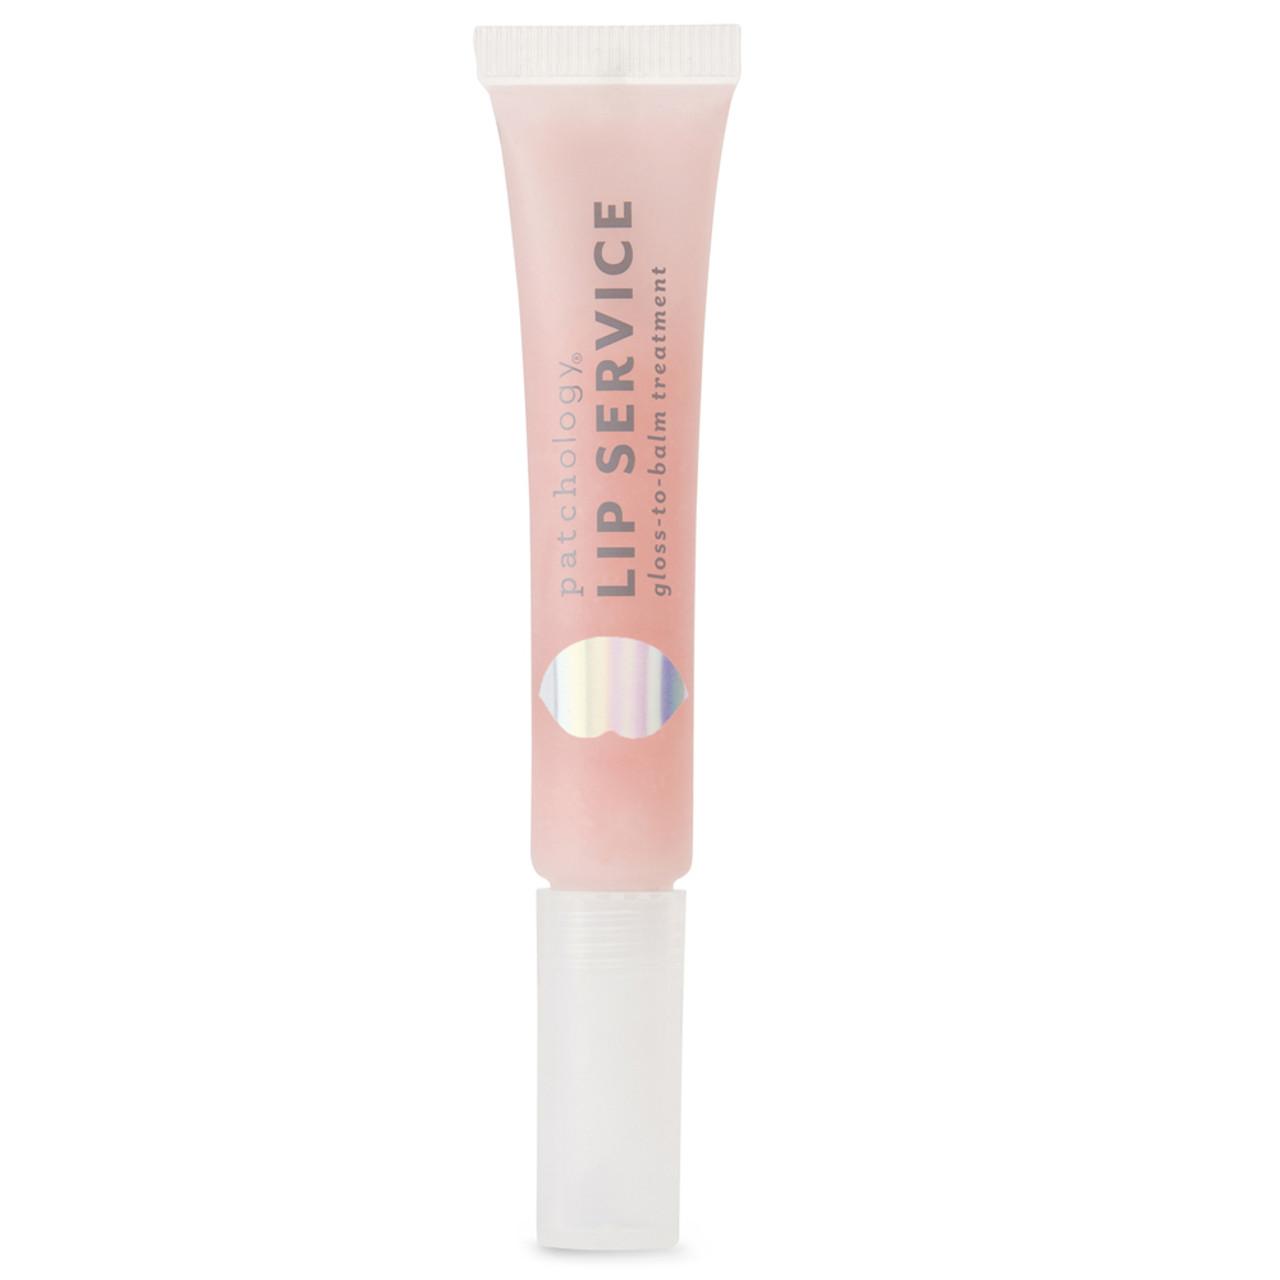 Patchology Lip Service Gloss-To-Balm Treatment BeautifiedYou.com